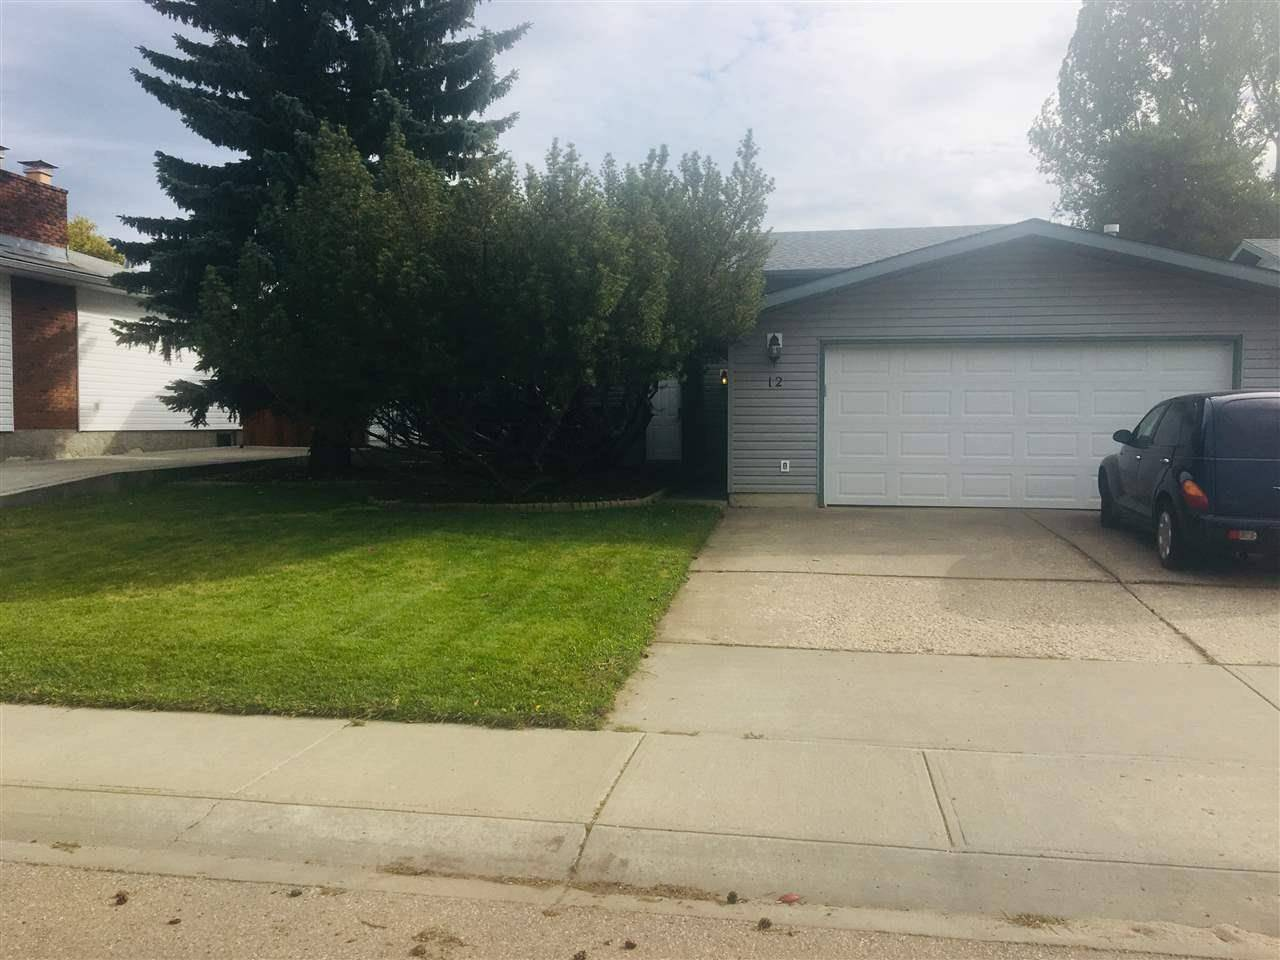 House for sale at 12 Bright Bank Ave Stony Plain Alberta - MLS: E4172750